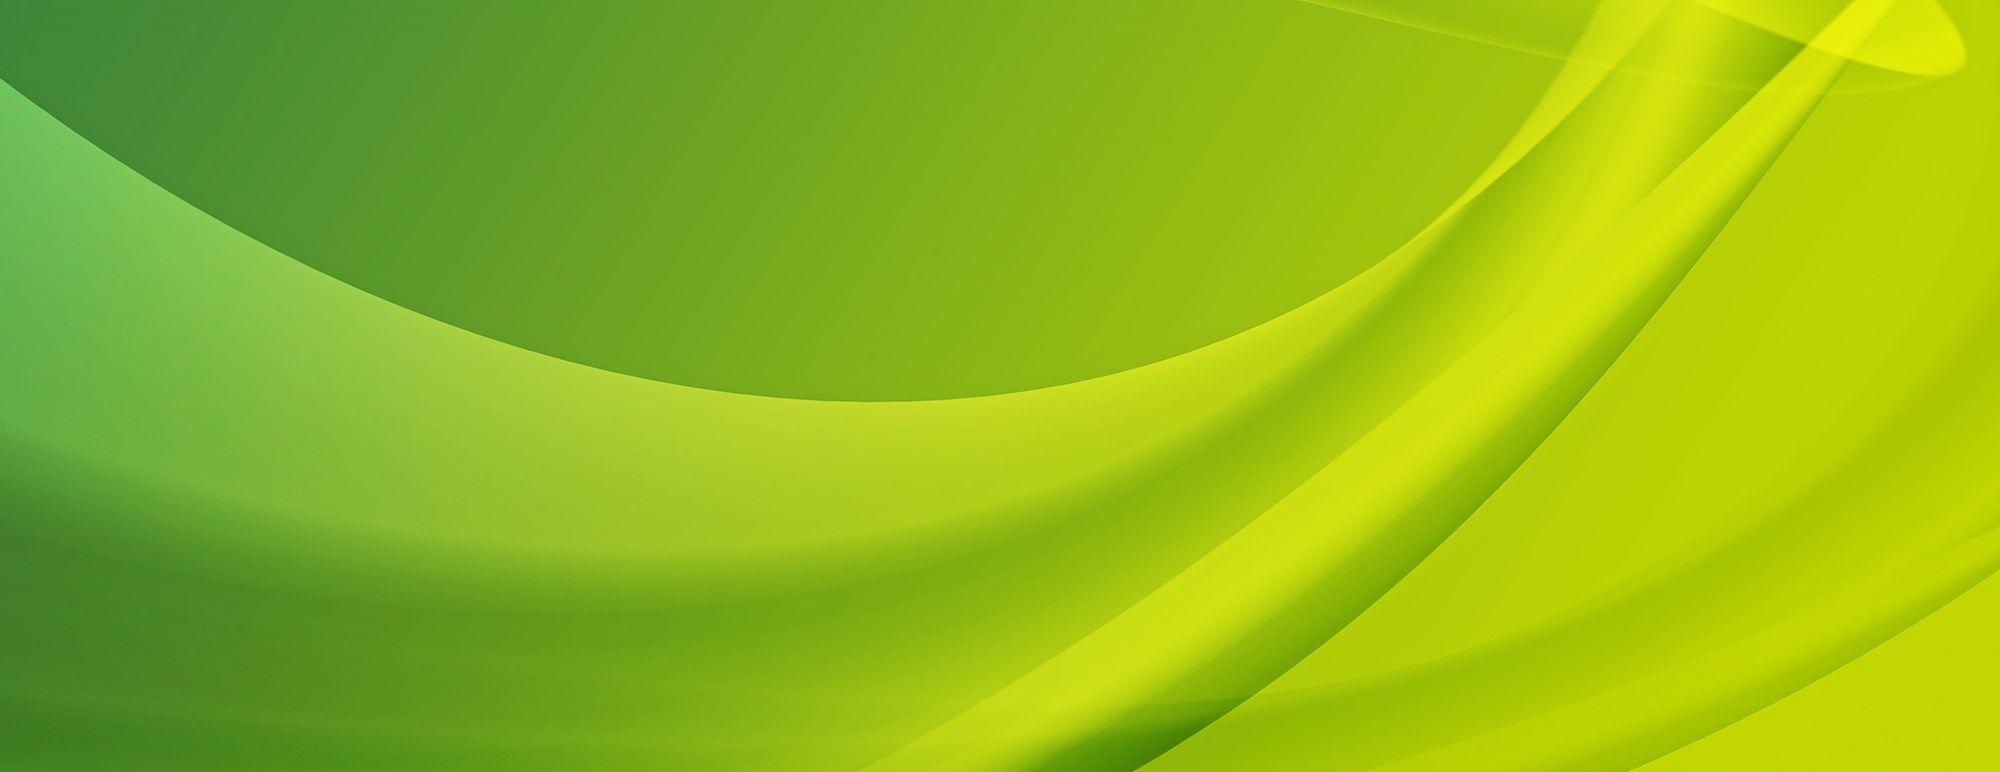 Web Design & Development Testimonials - CasaSoft Malta Europe